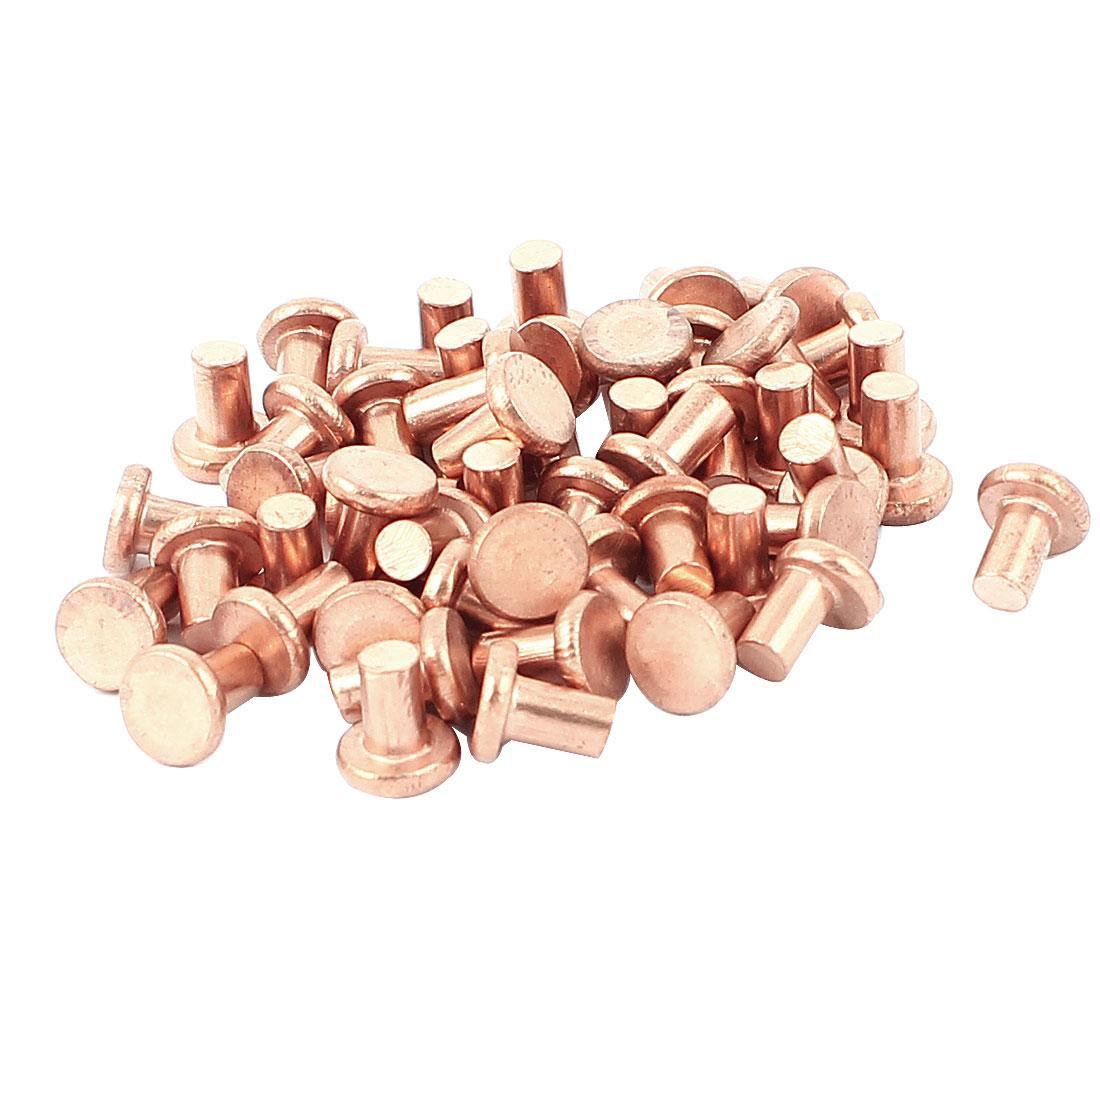 "50 Pcs 5/32"" Diameter 15/64"" Long Shank Flat Head Copper Solid Rivets Fasteners"